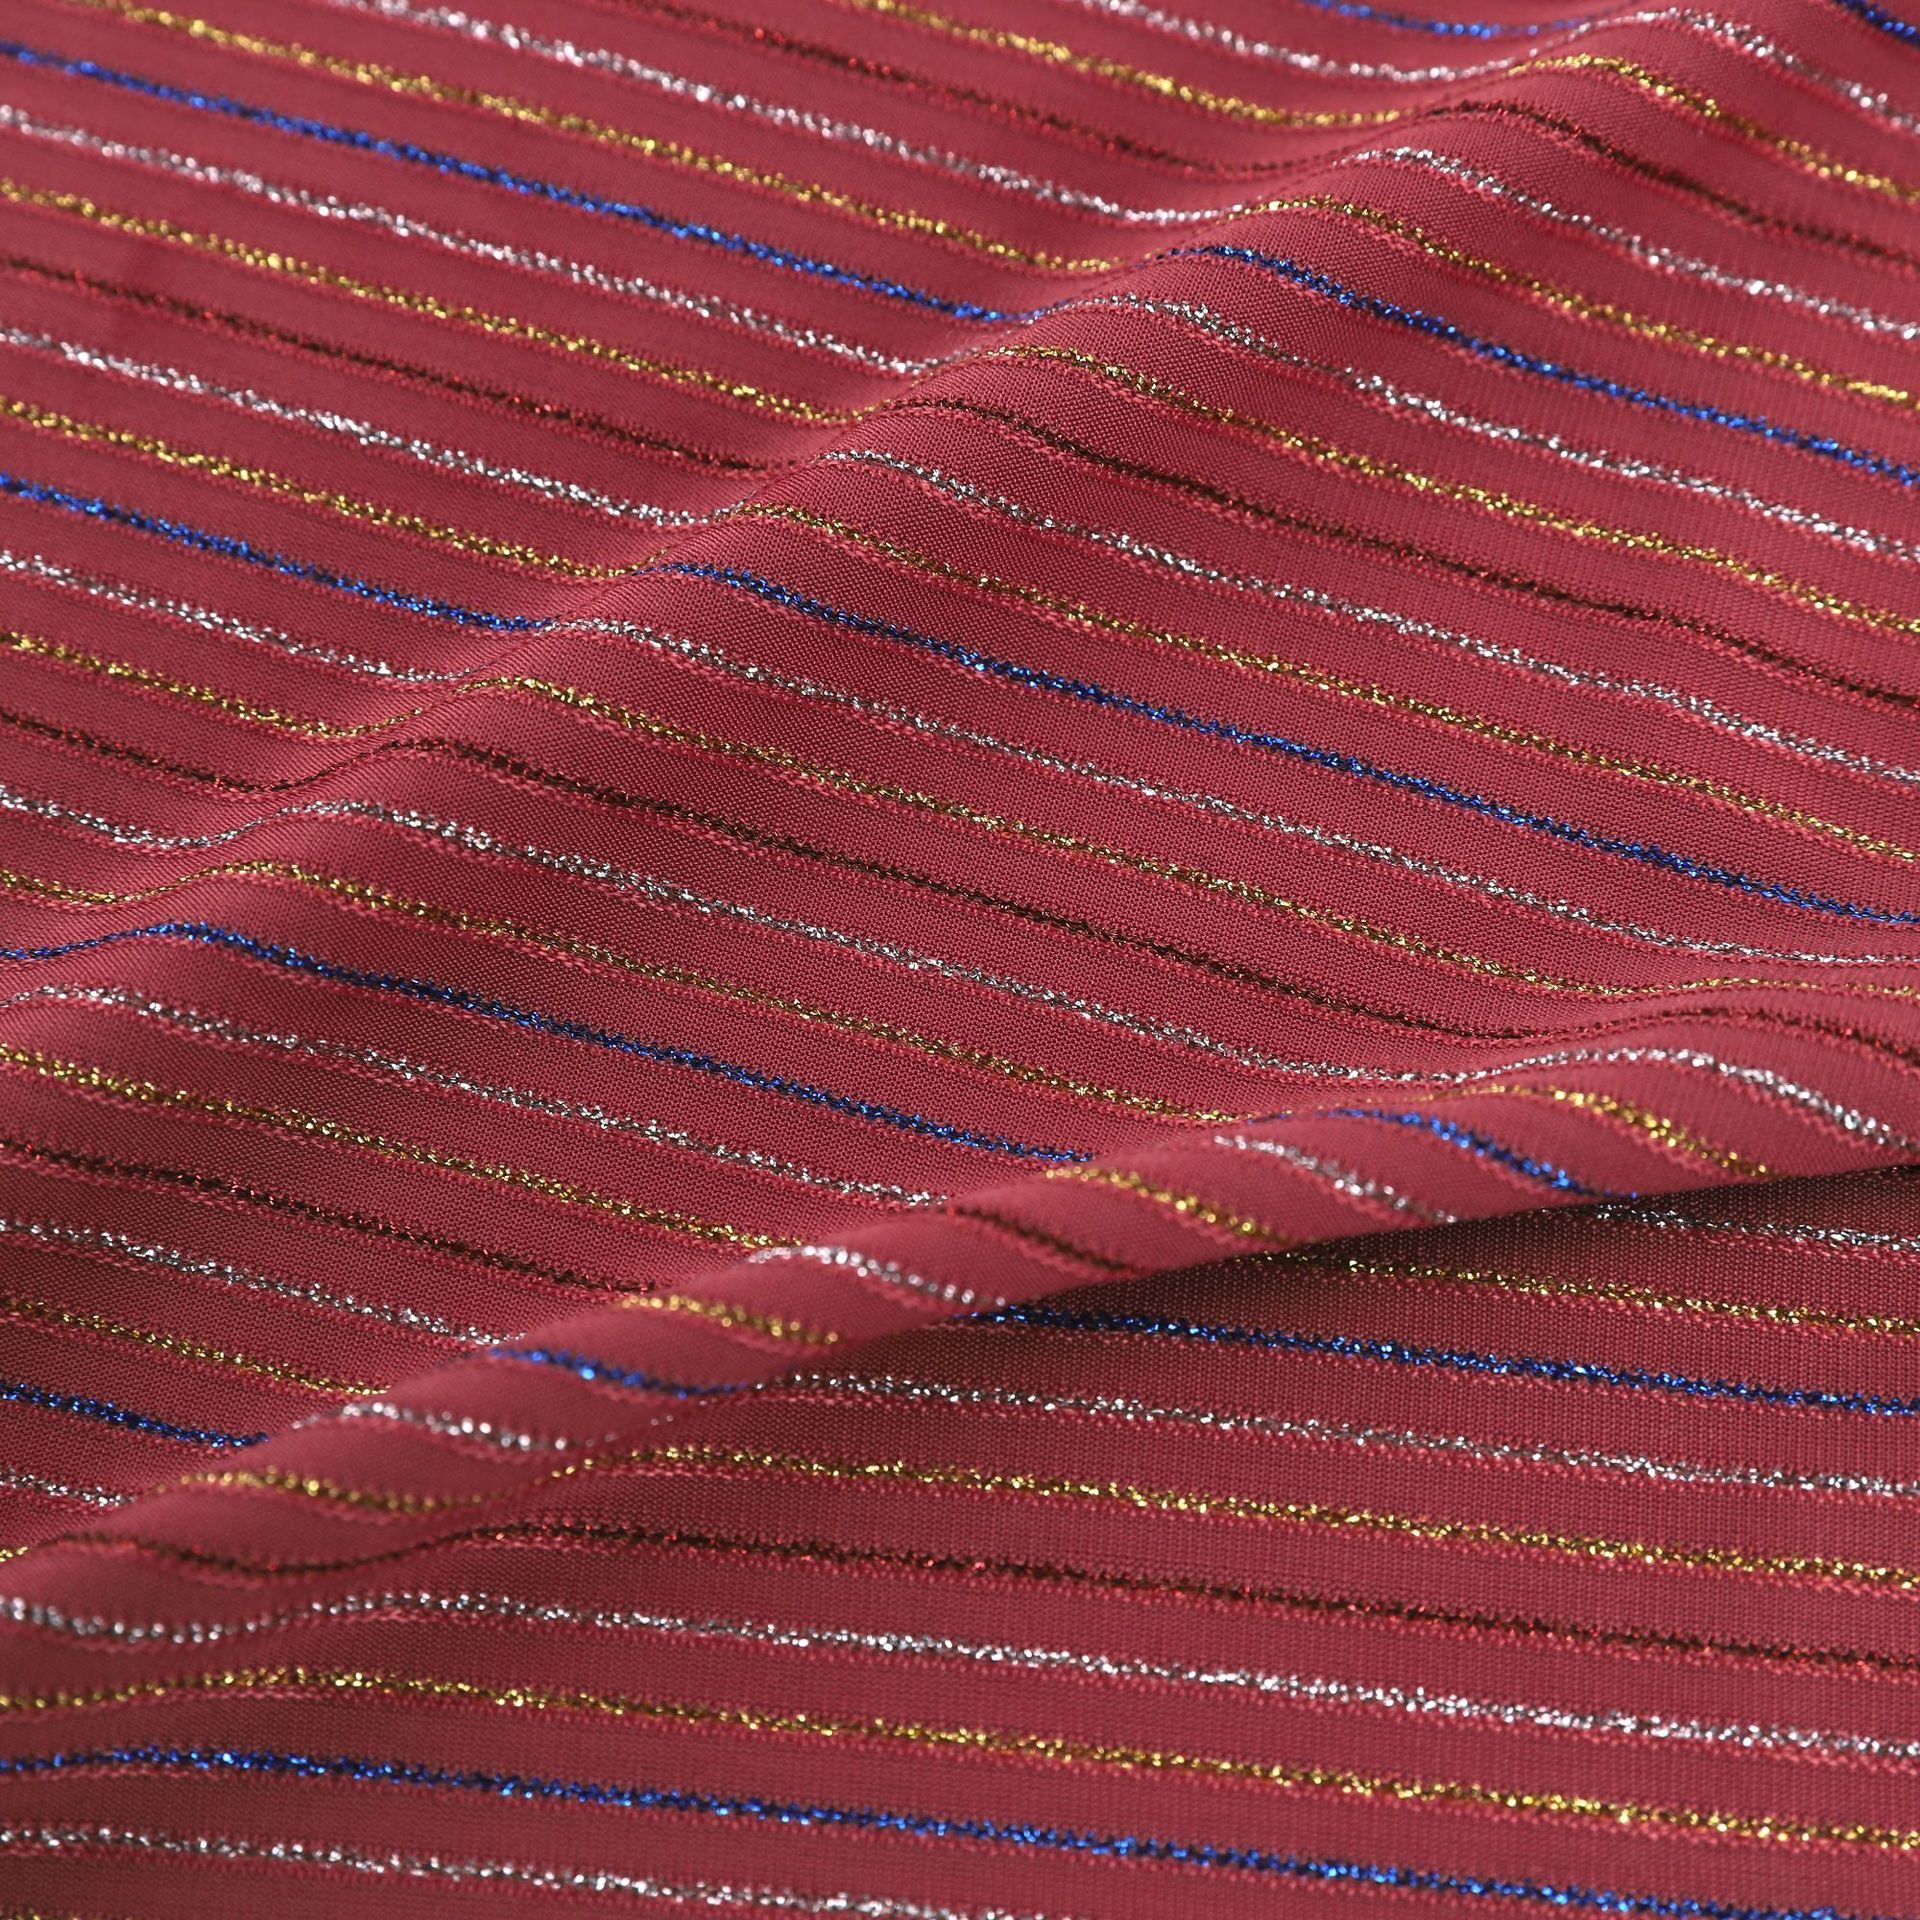 Customized Chiffon Fabric Metal Polyester Fabric Comfortable And Soft Dress Fabric